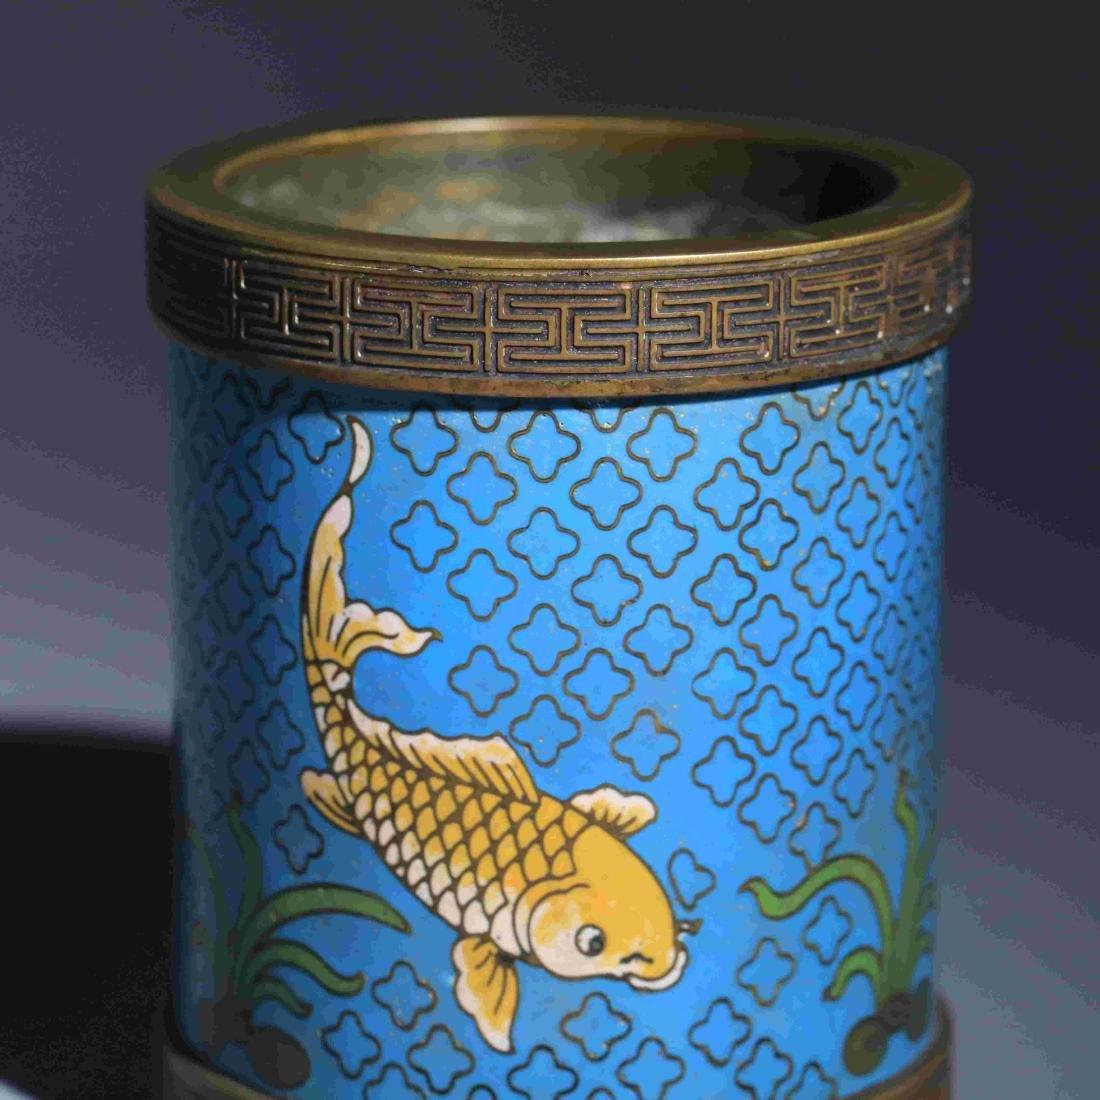 BRONZE GLAZED ENAMEL FISH PATTERN PEN CONTAINER - 4